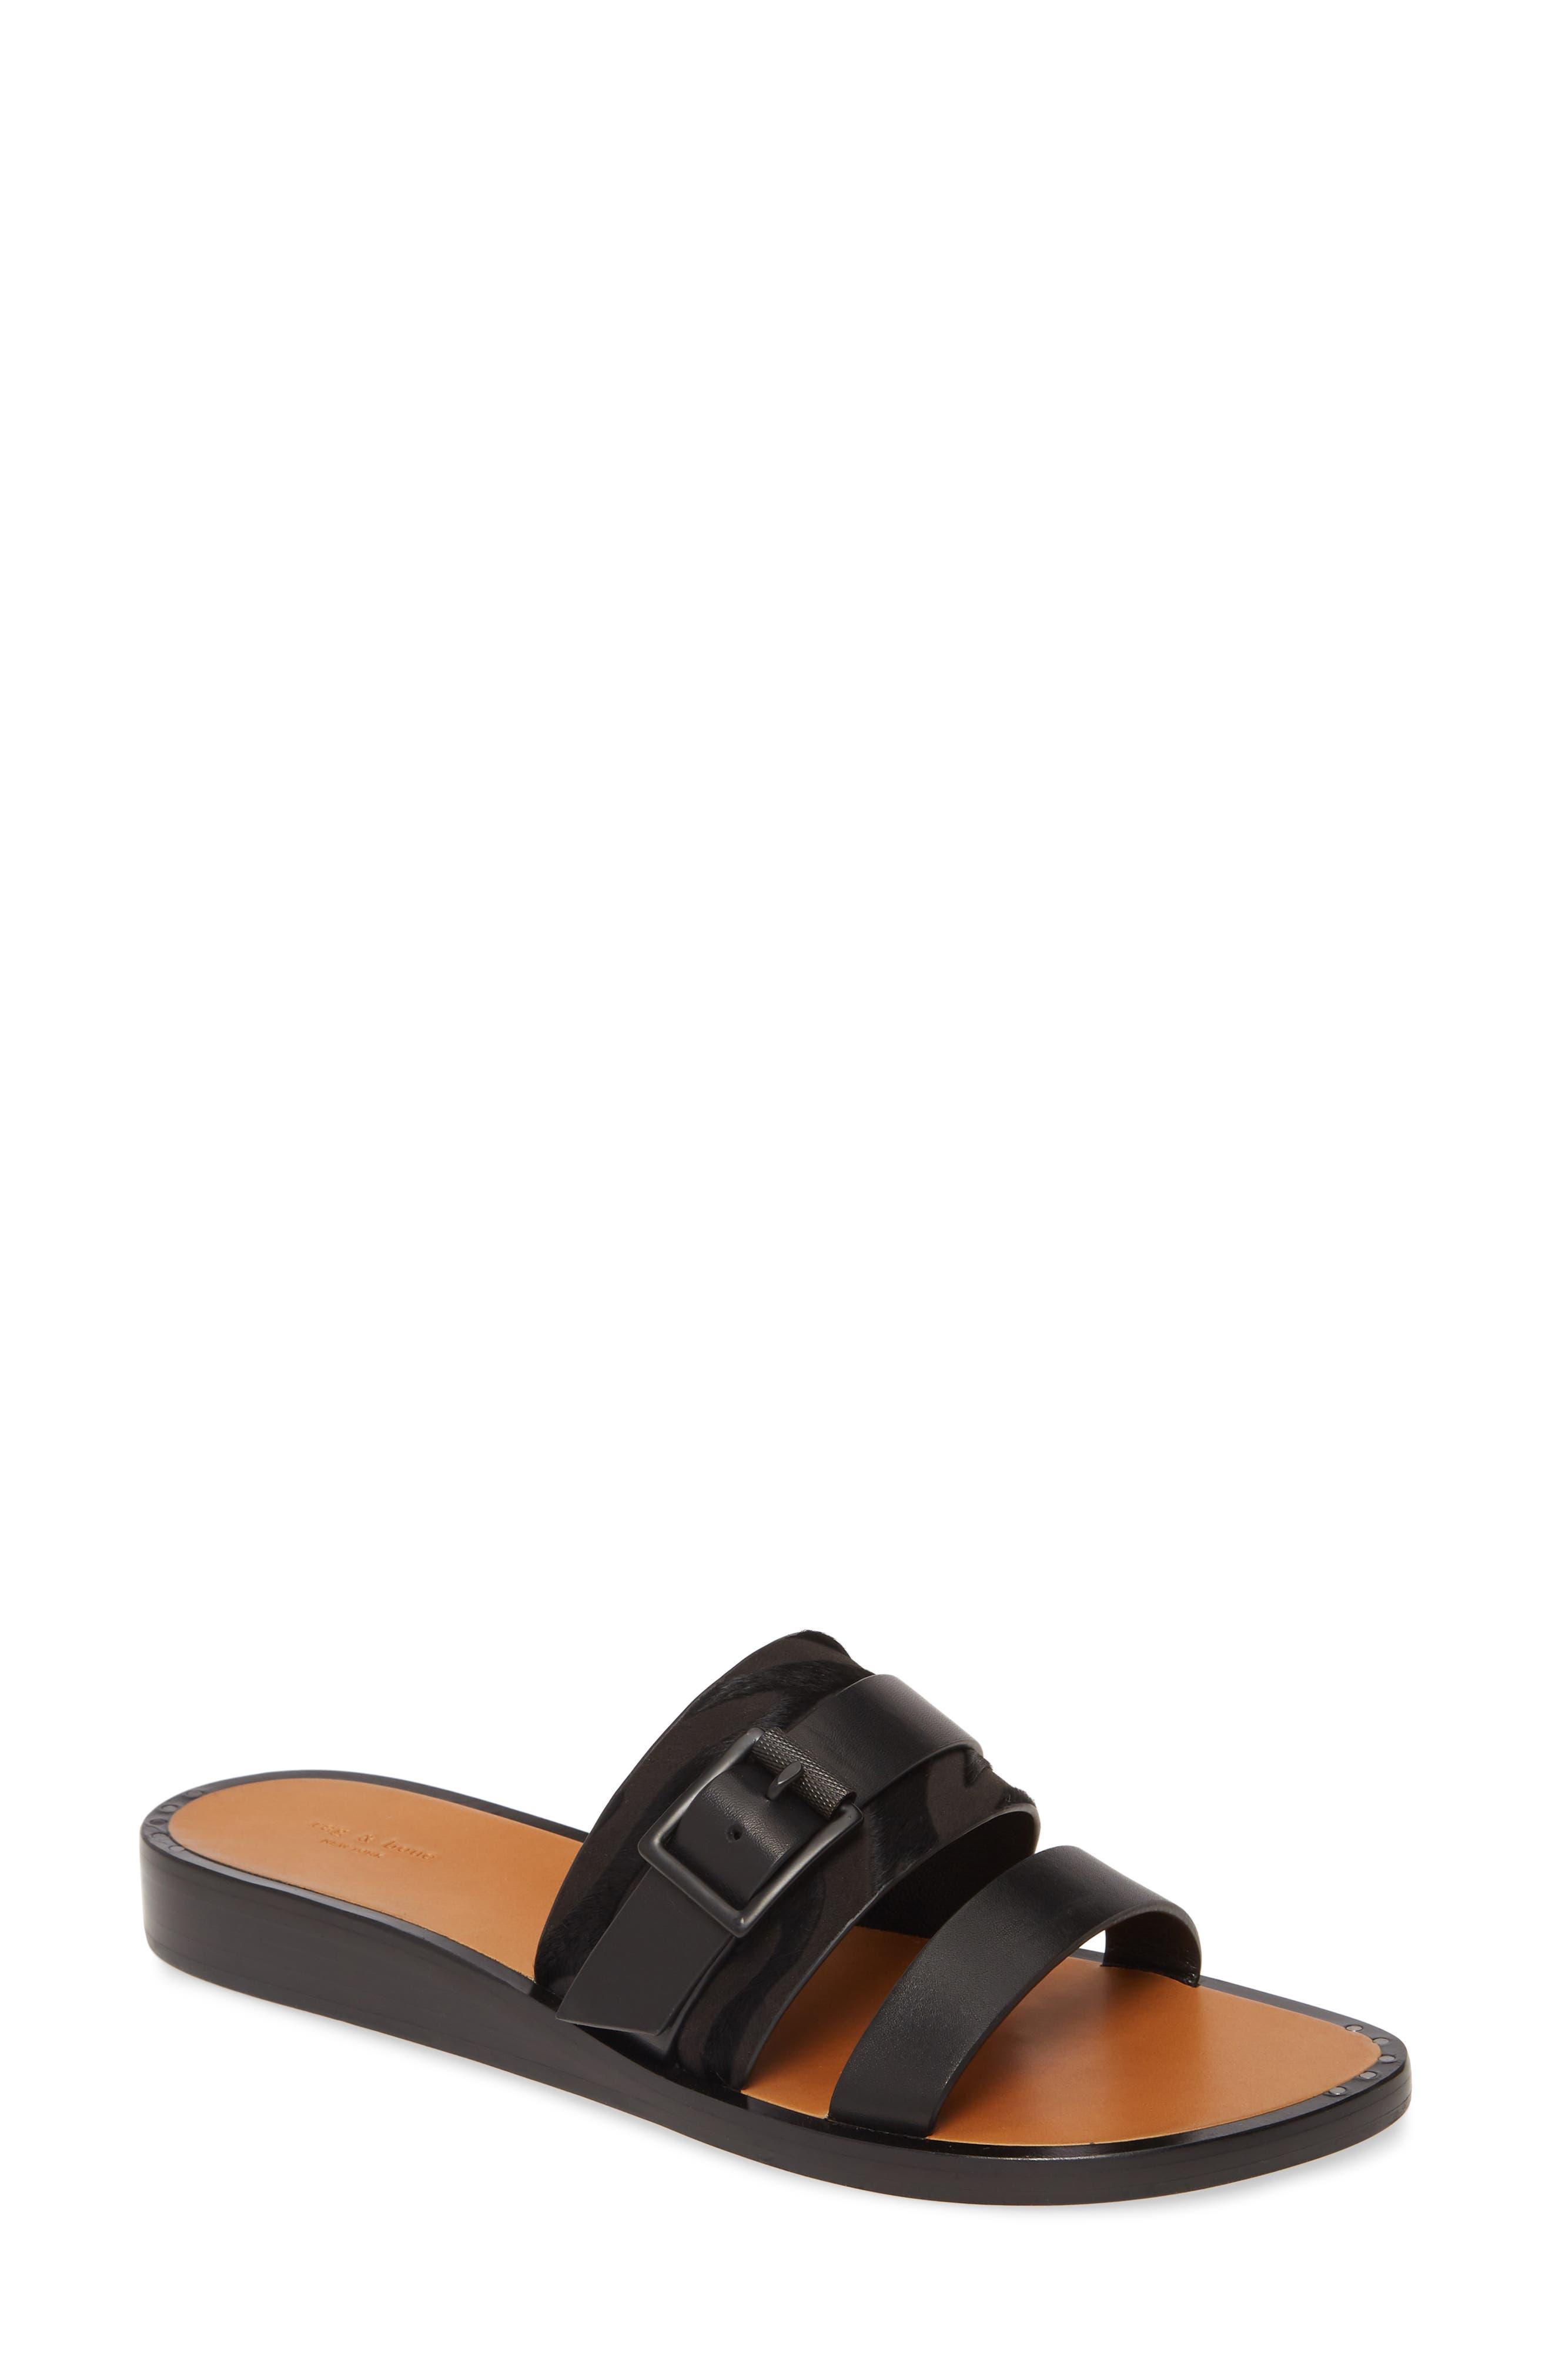 Image of Rag & Bone Arley Slide Sandal